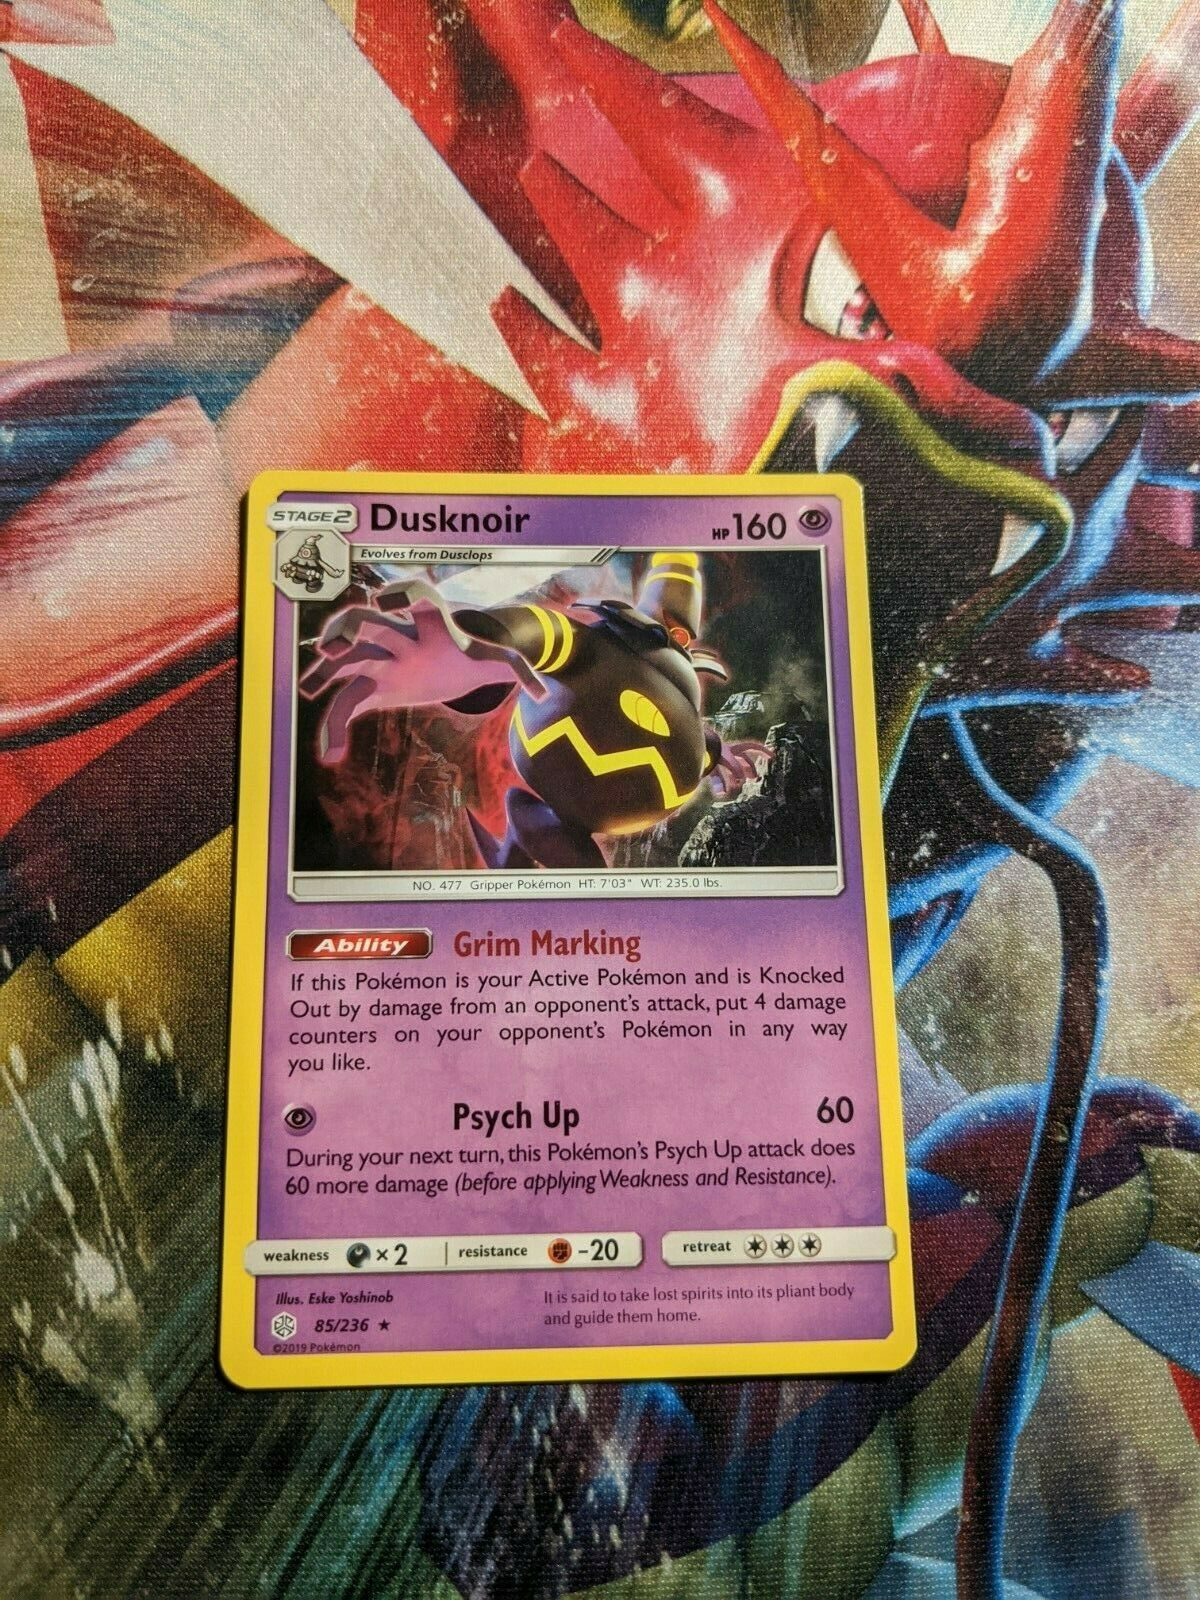 Dusknoir 85/236 - Rare non holo Pokemon Card - Cosmic Eclipse Set (2019) - NM - Image 1